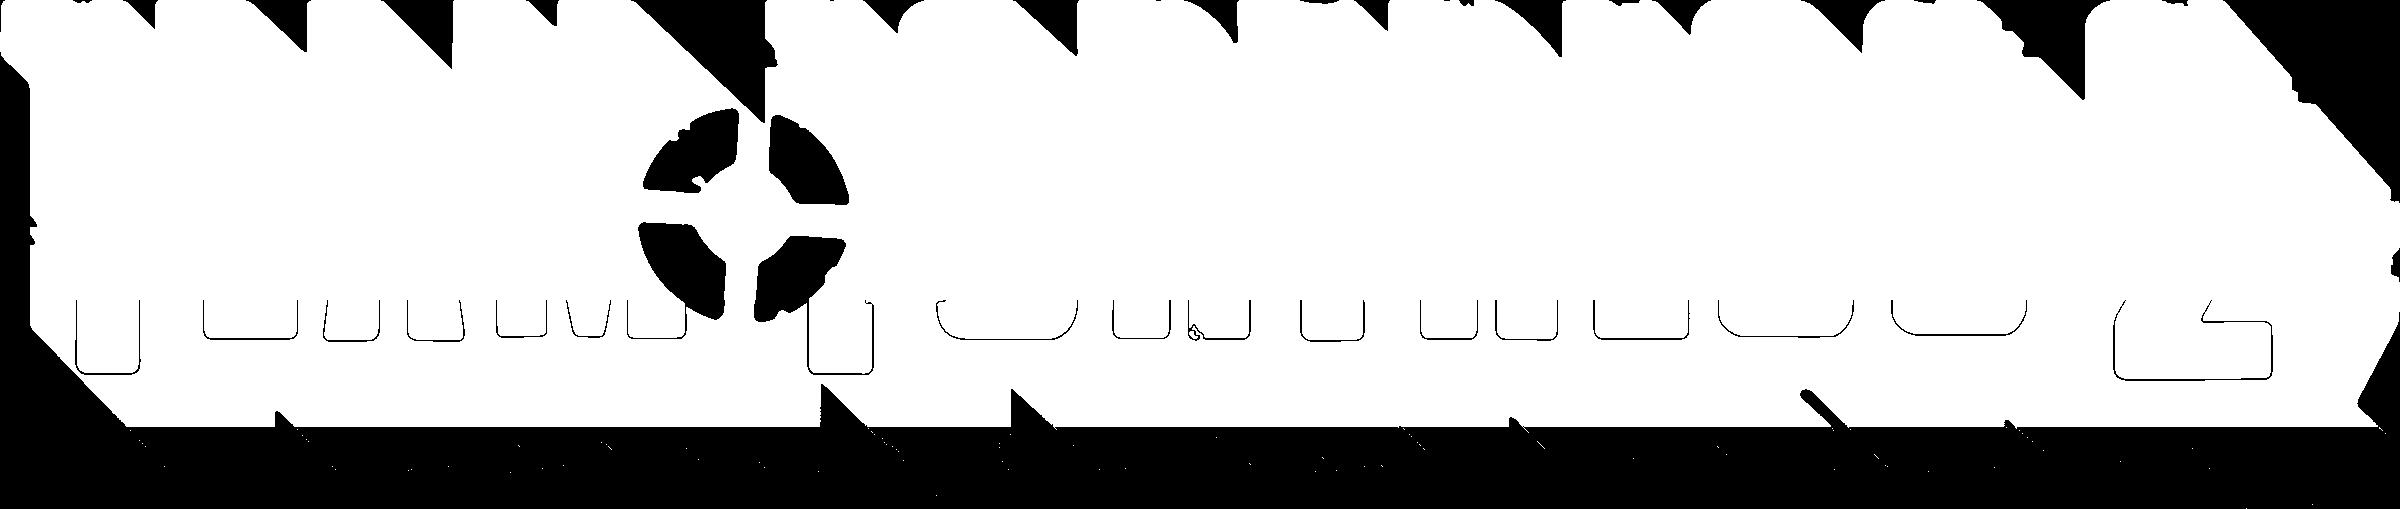 Team Fortress 2 Logo Png Transparent Svg Vector Freebie Supply